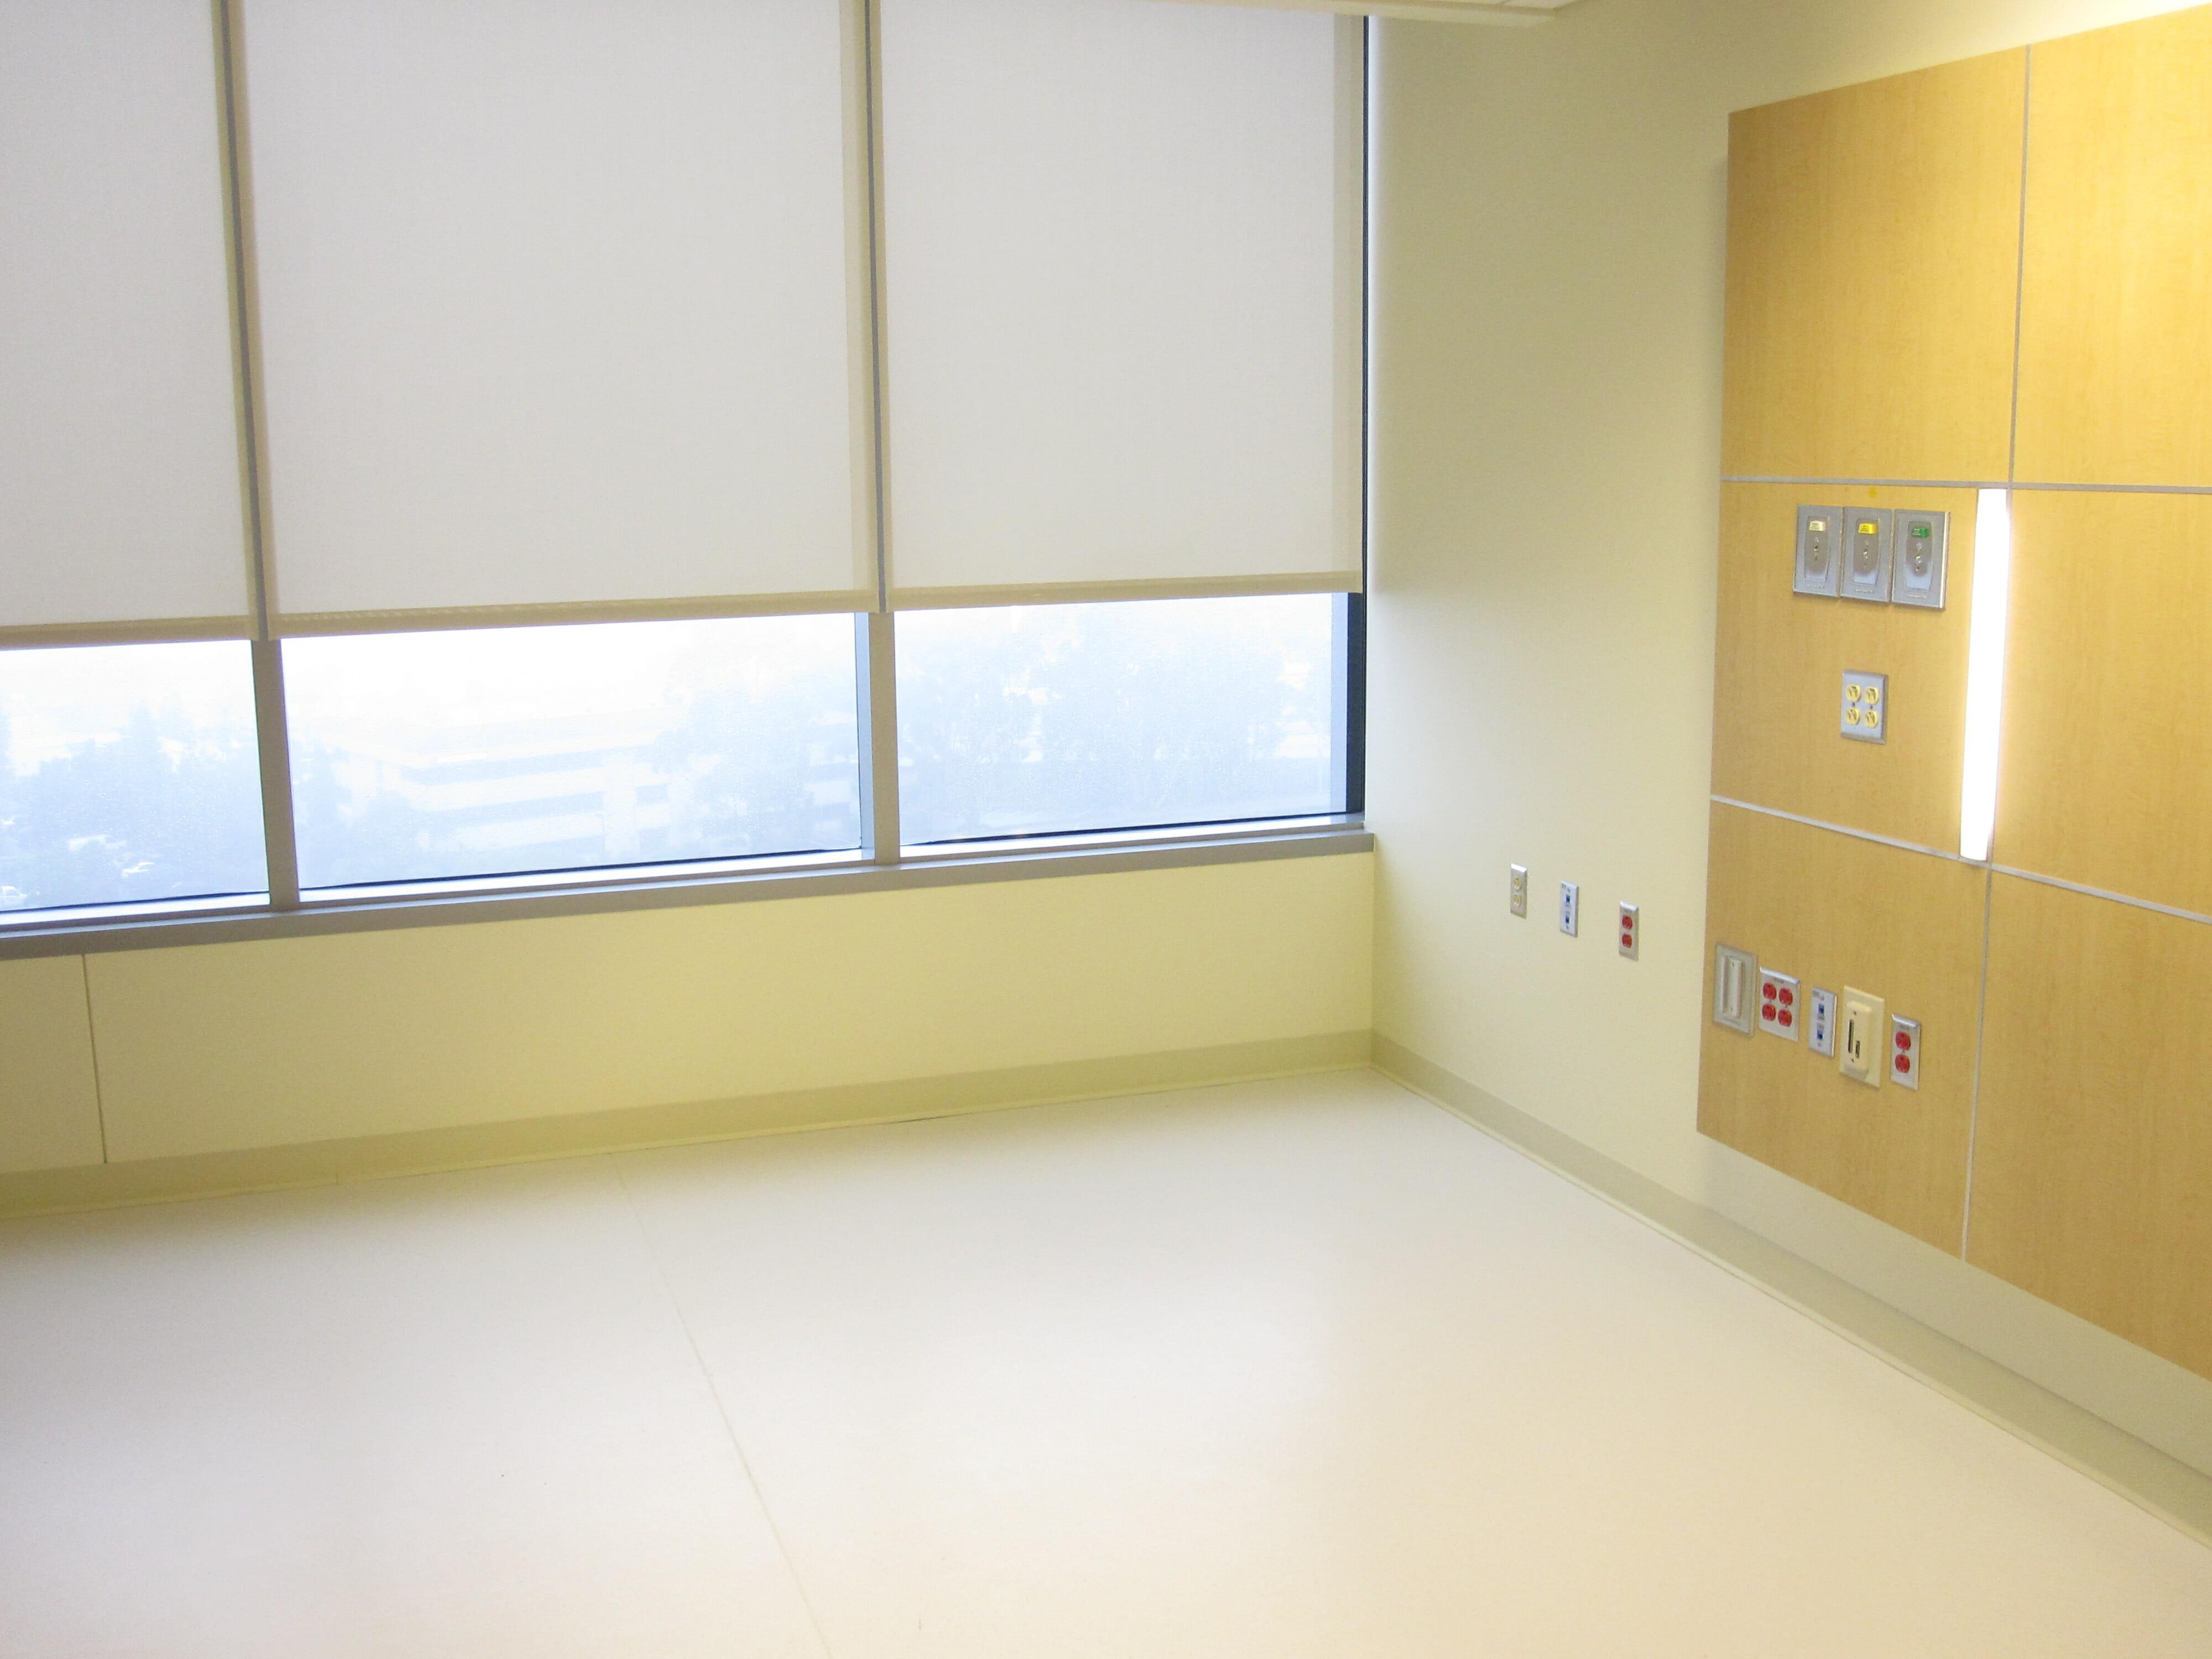 window treatments san diego bestfunnyvideos me skyco roller shades sharp memorial hospital san diego ca nbbj blind mice window coverings